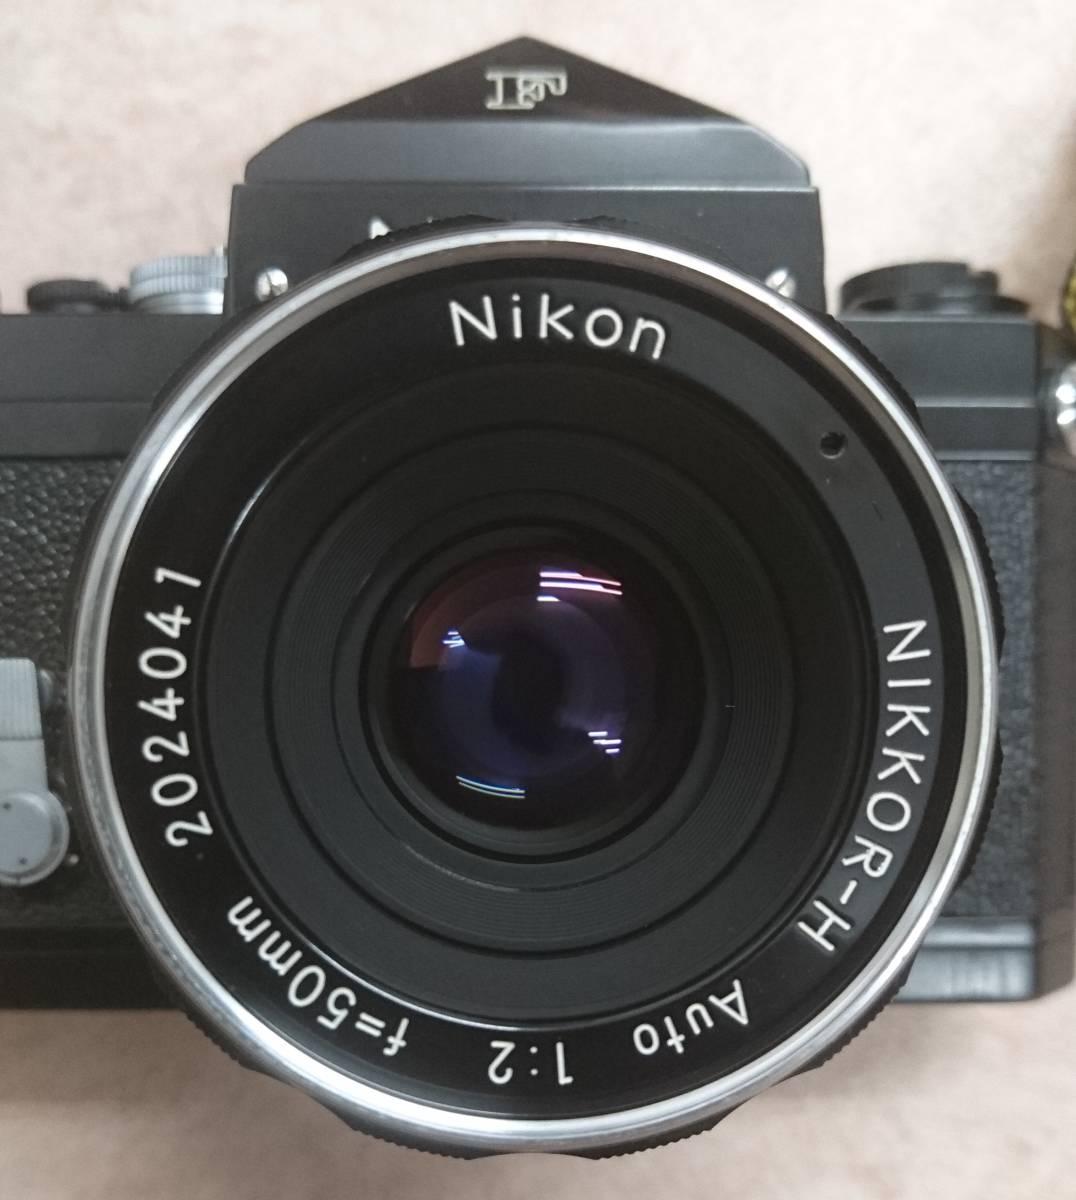 ◇ Nikon F Brack ニコンFブラックボディ NIKKOR-H Auto 1:2 f=50㎜ ◇_画像9